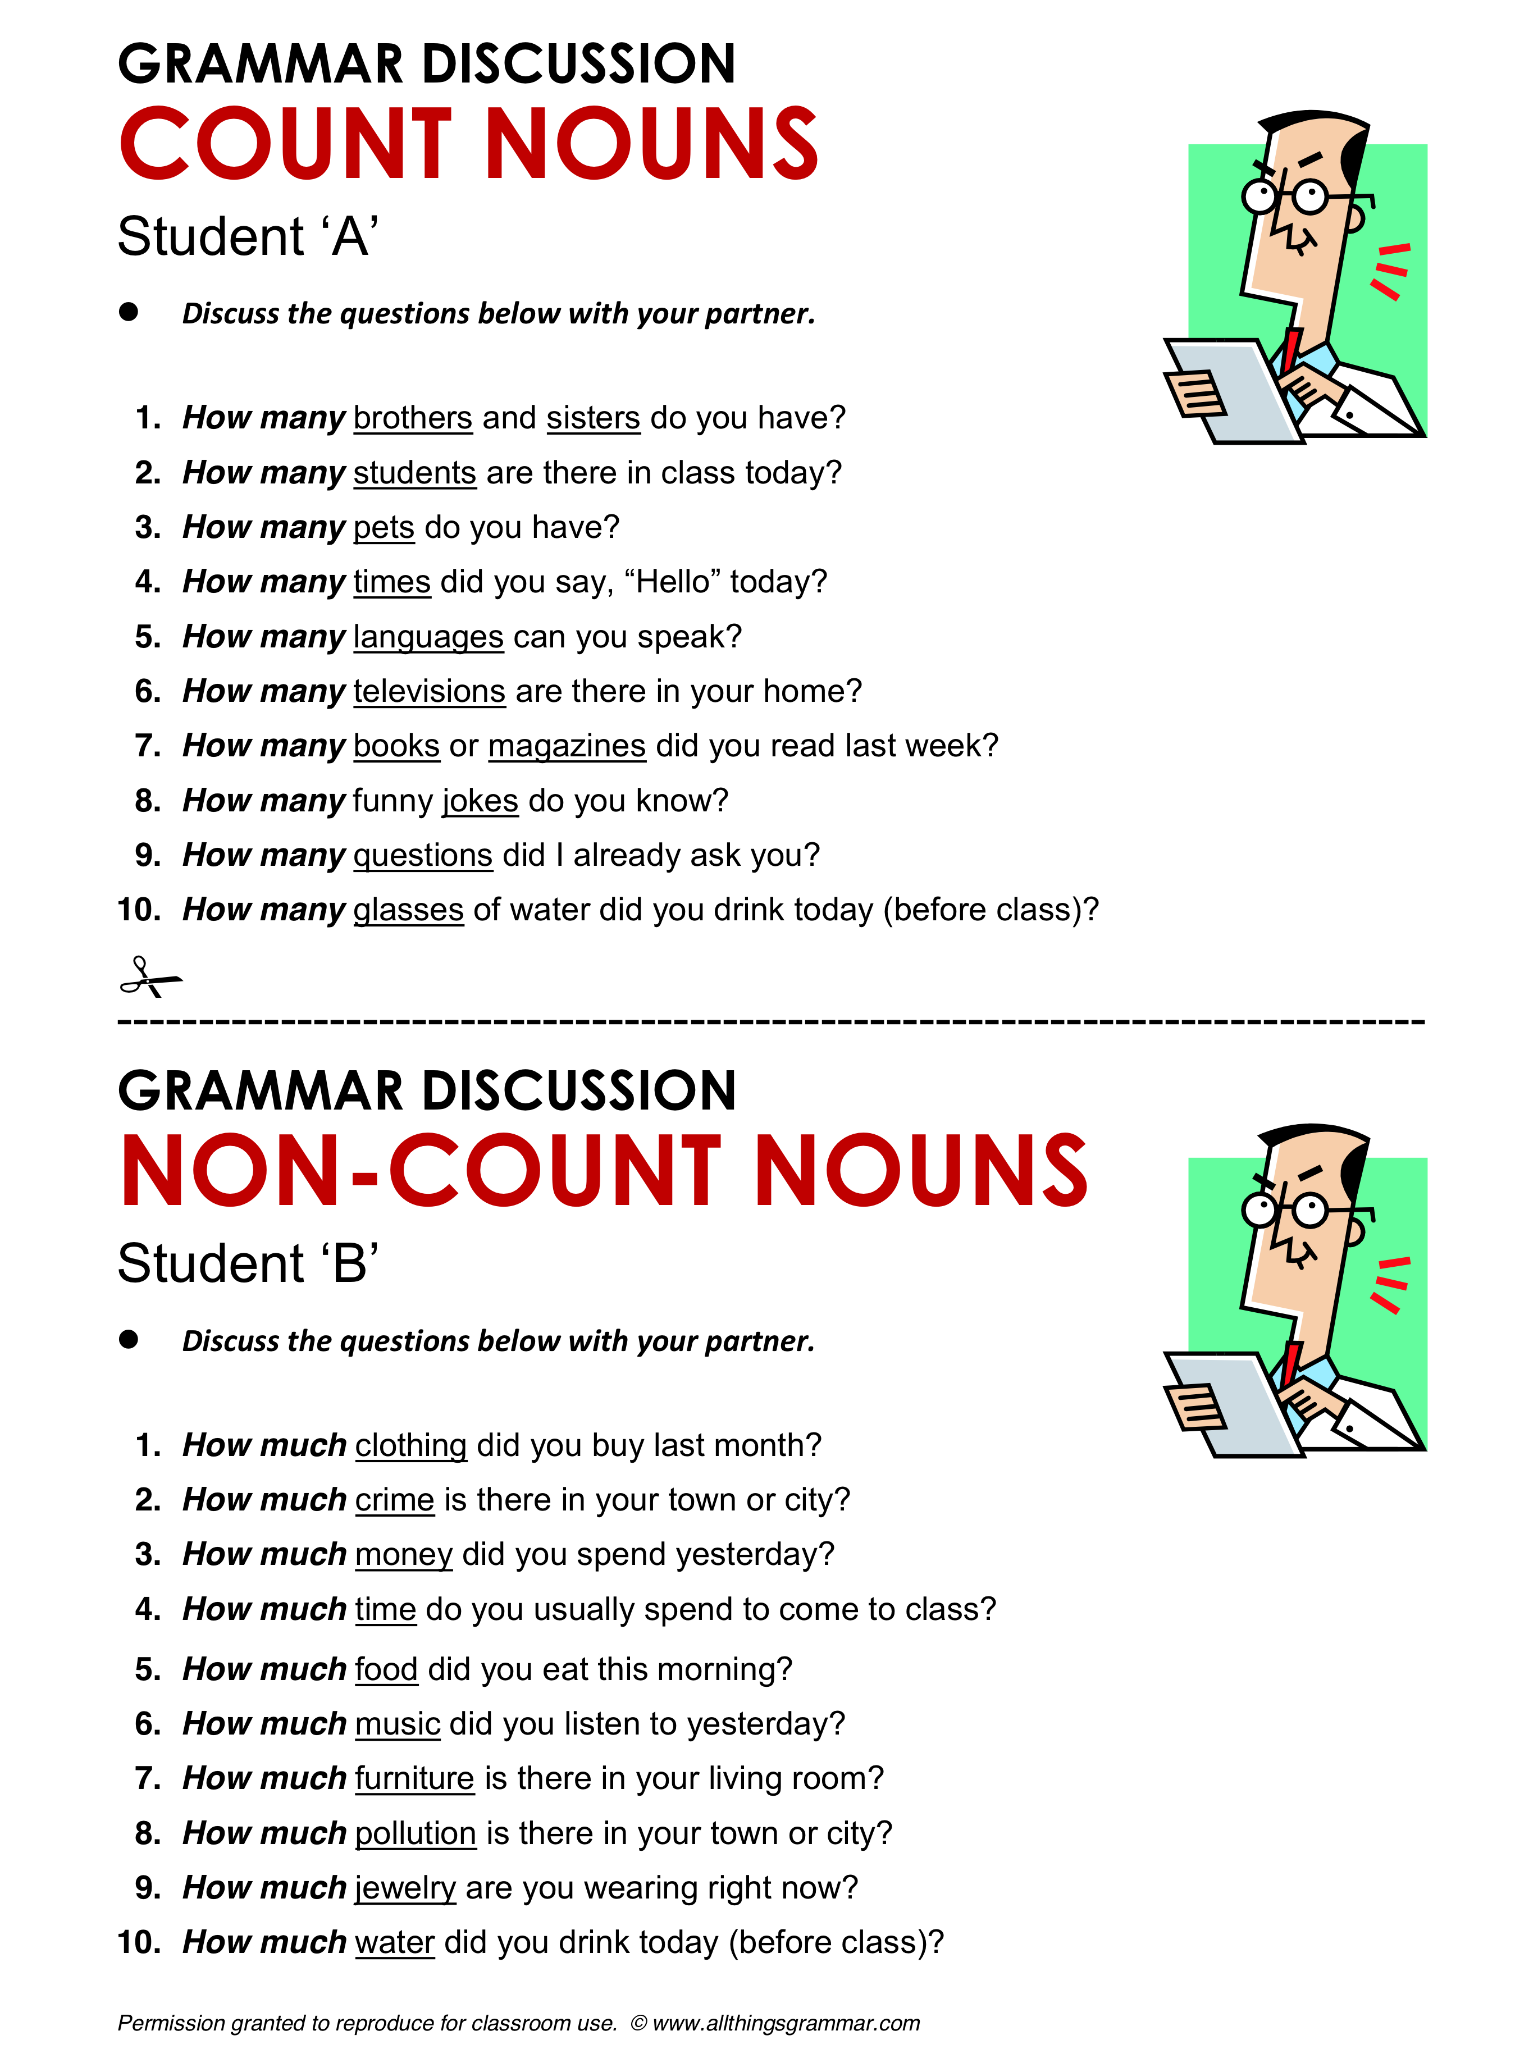 English Grammar Count and Non-Count Nouns www.allthingsgrammar.com ...